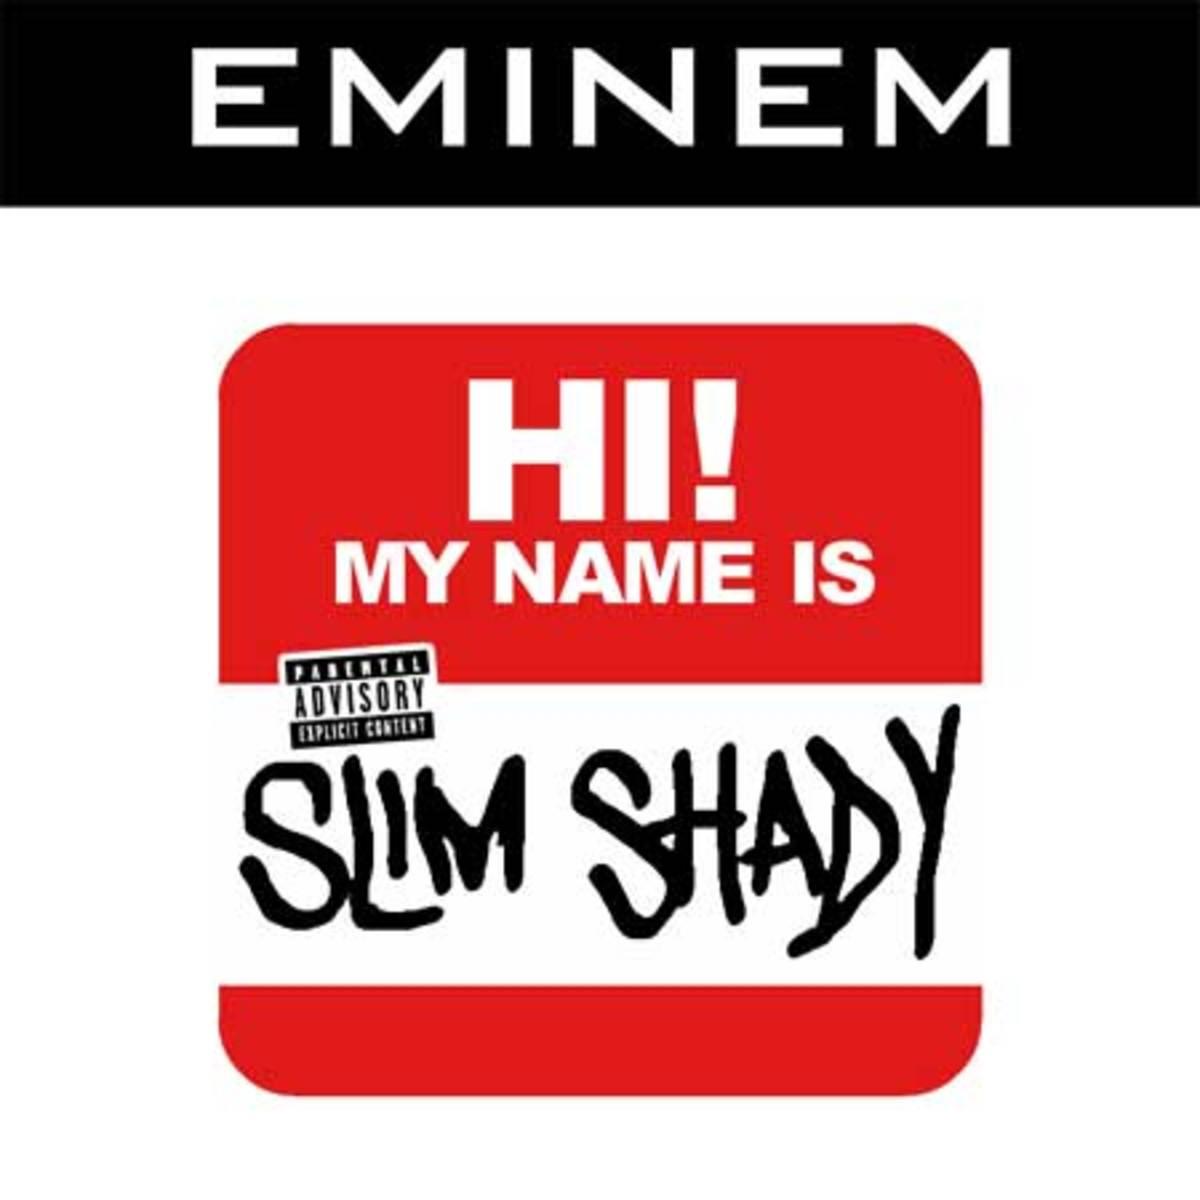 eminem-my-name-is.jpg